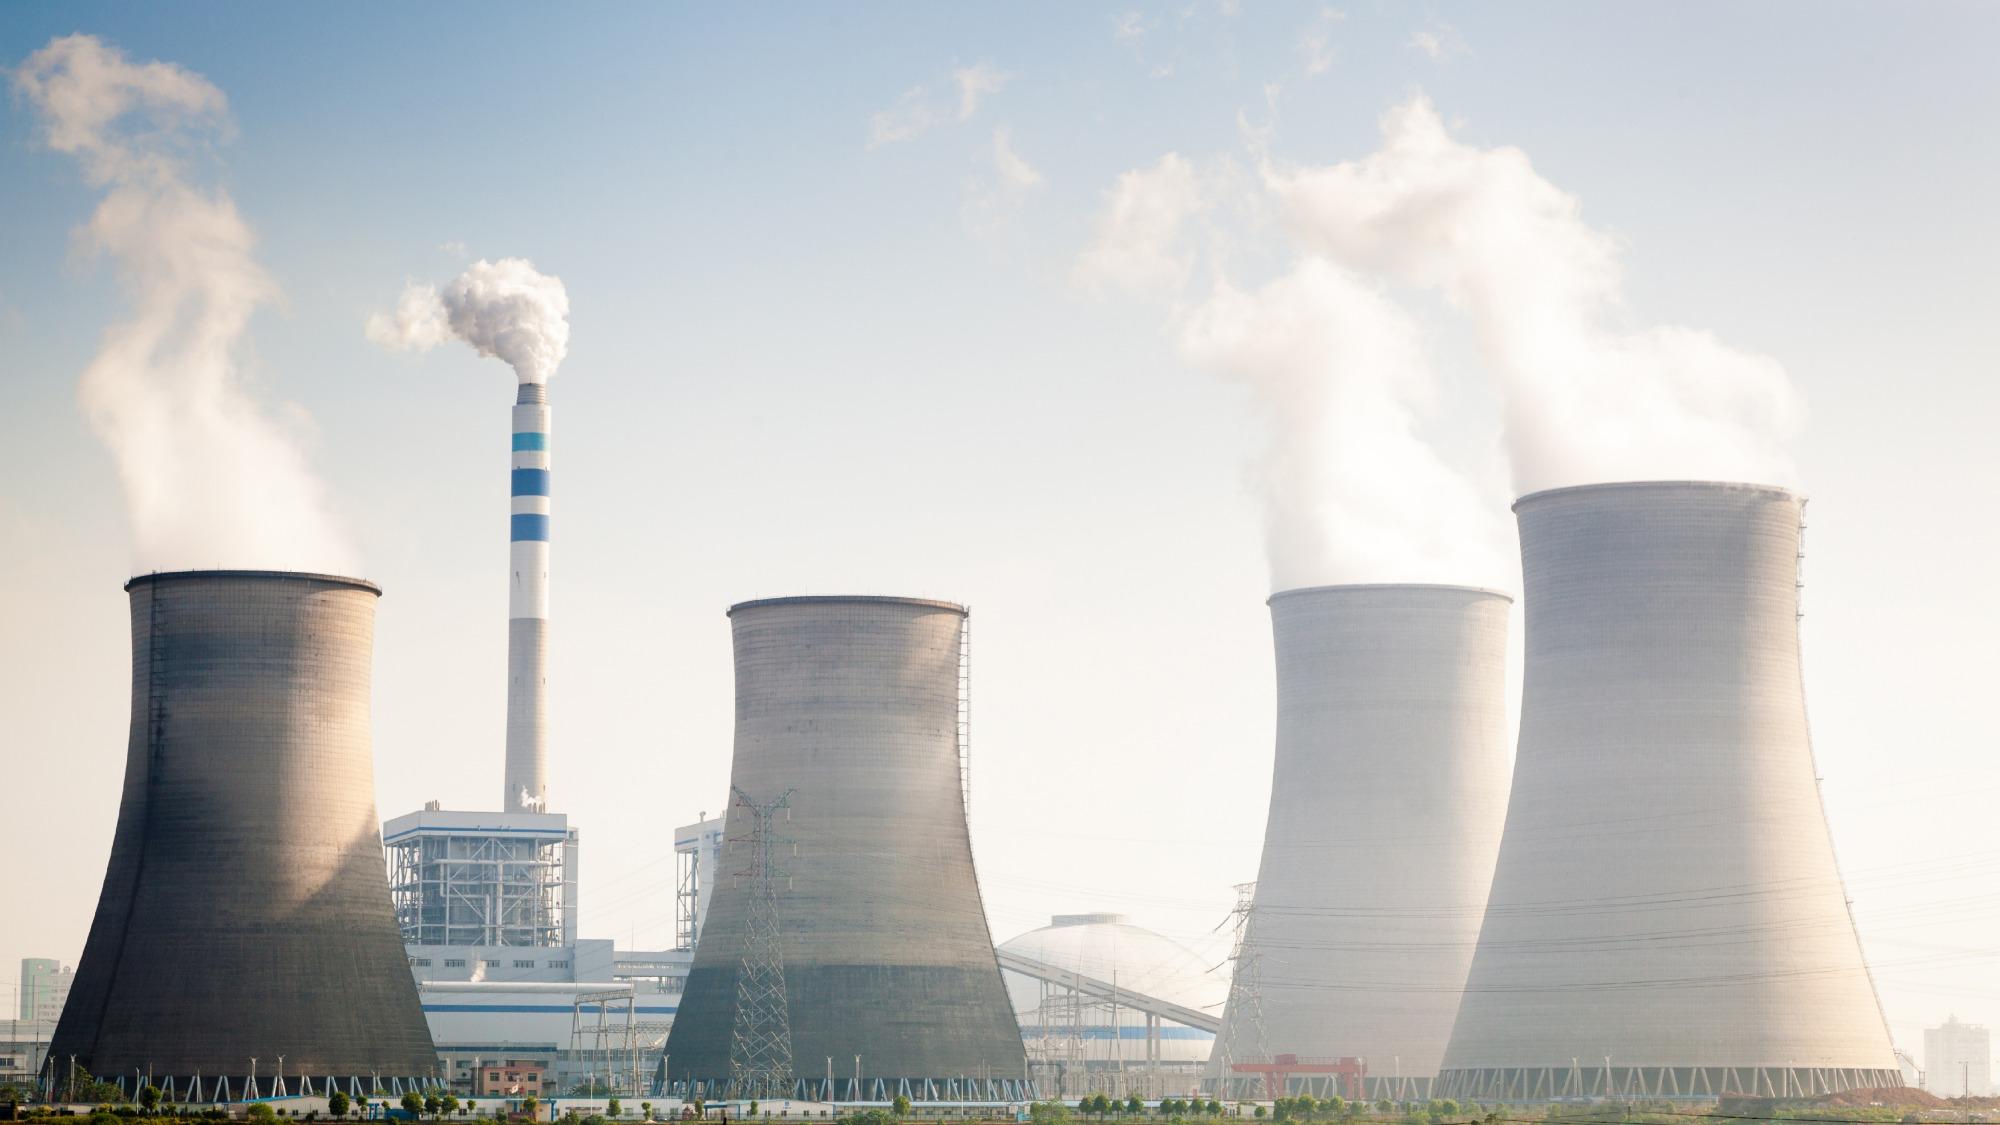 Dukovany Nuclear Power Station